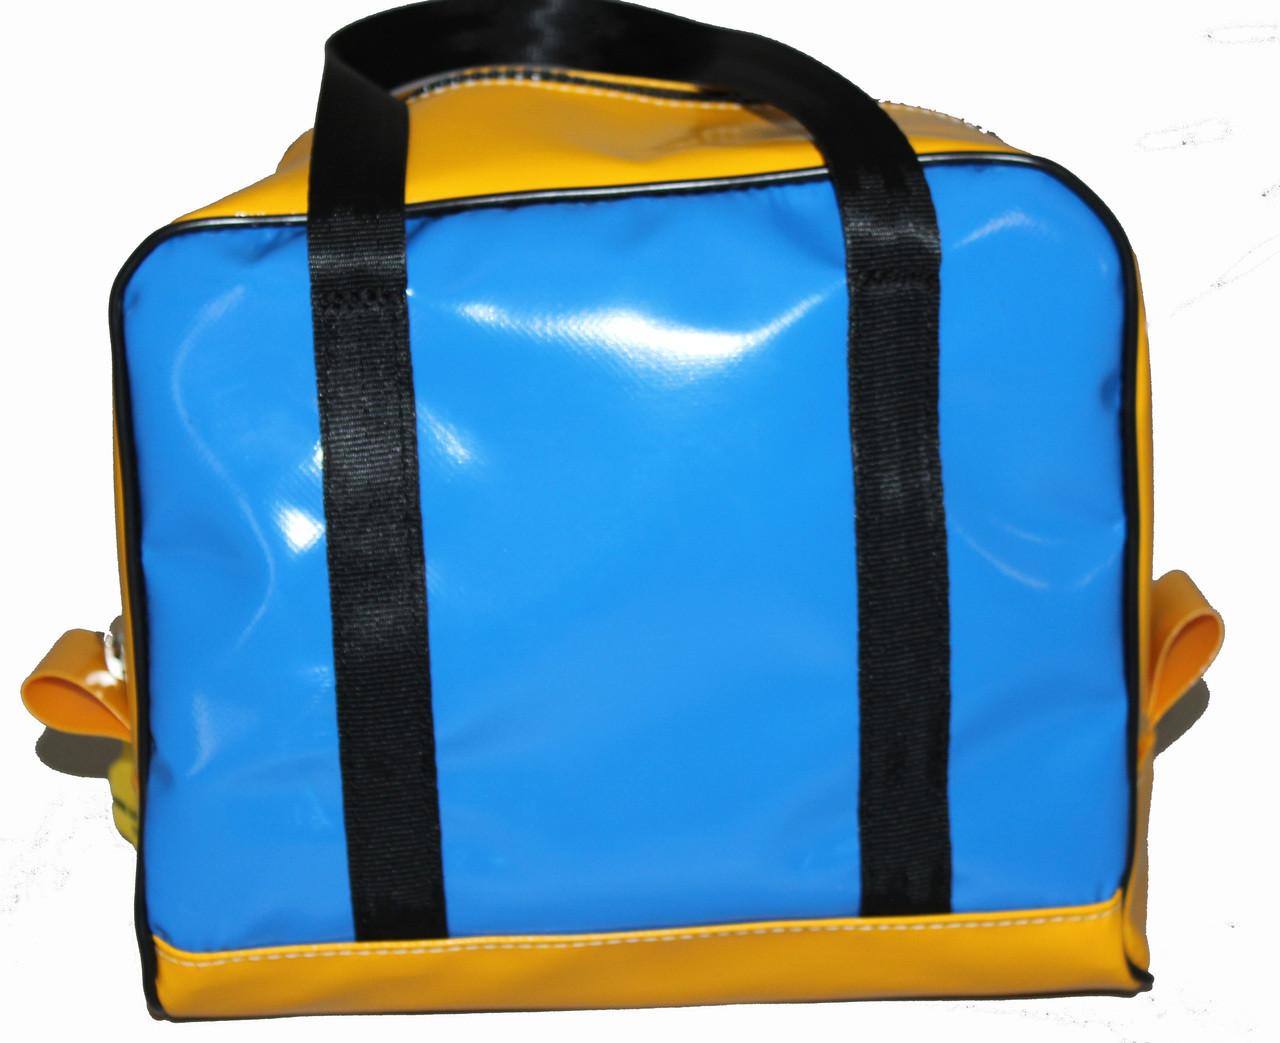 Box Bag Wet Pack Australian Made 27cm L x 20cm H x 17cm  W